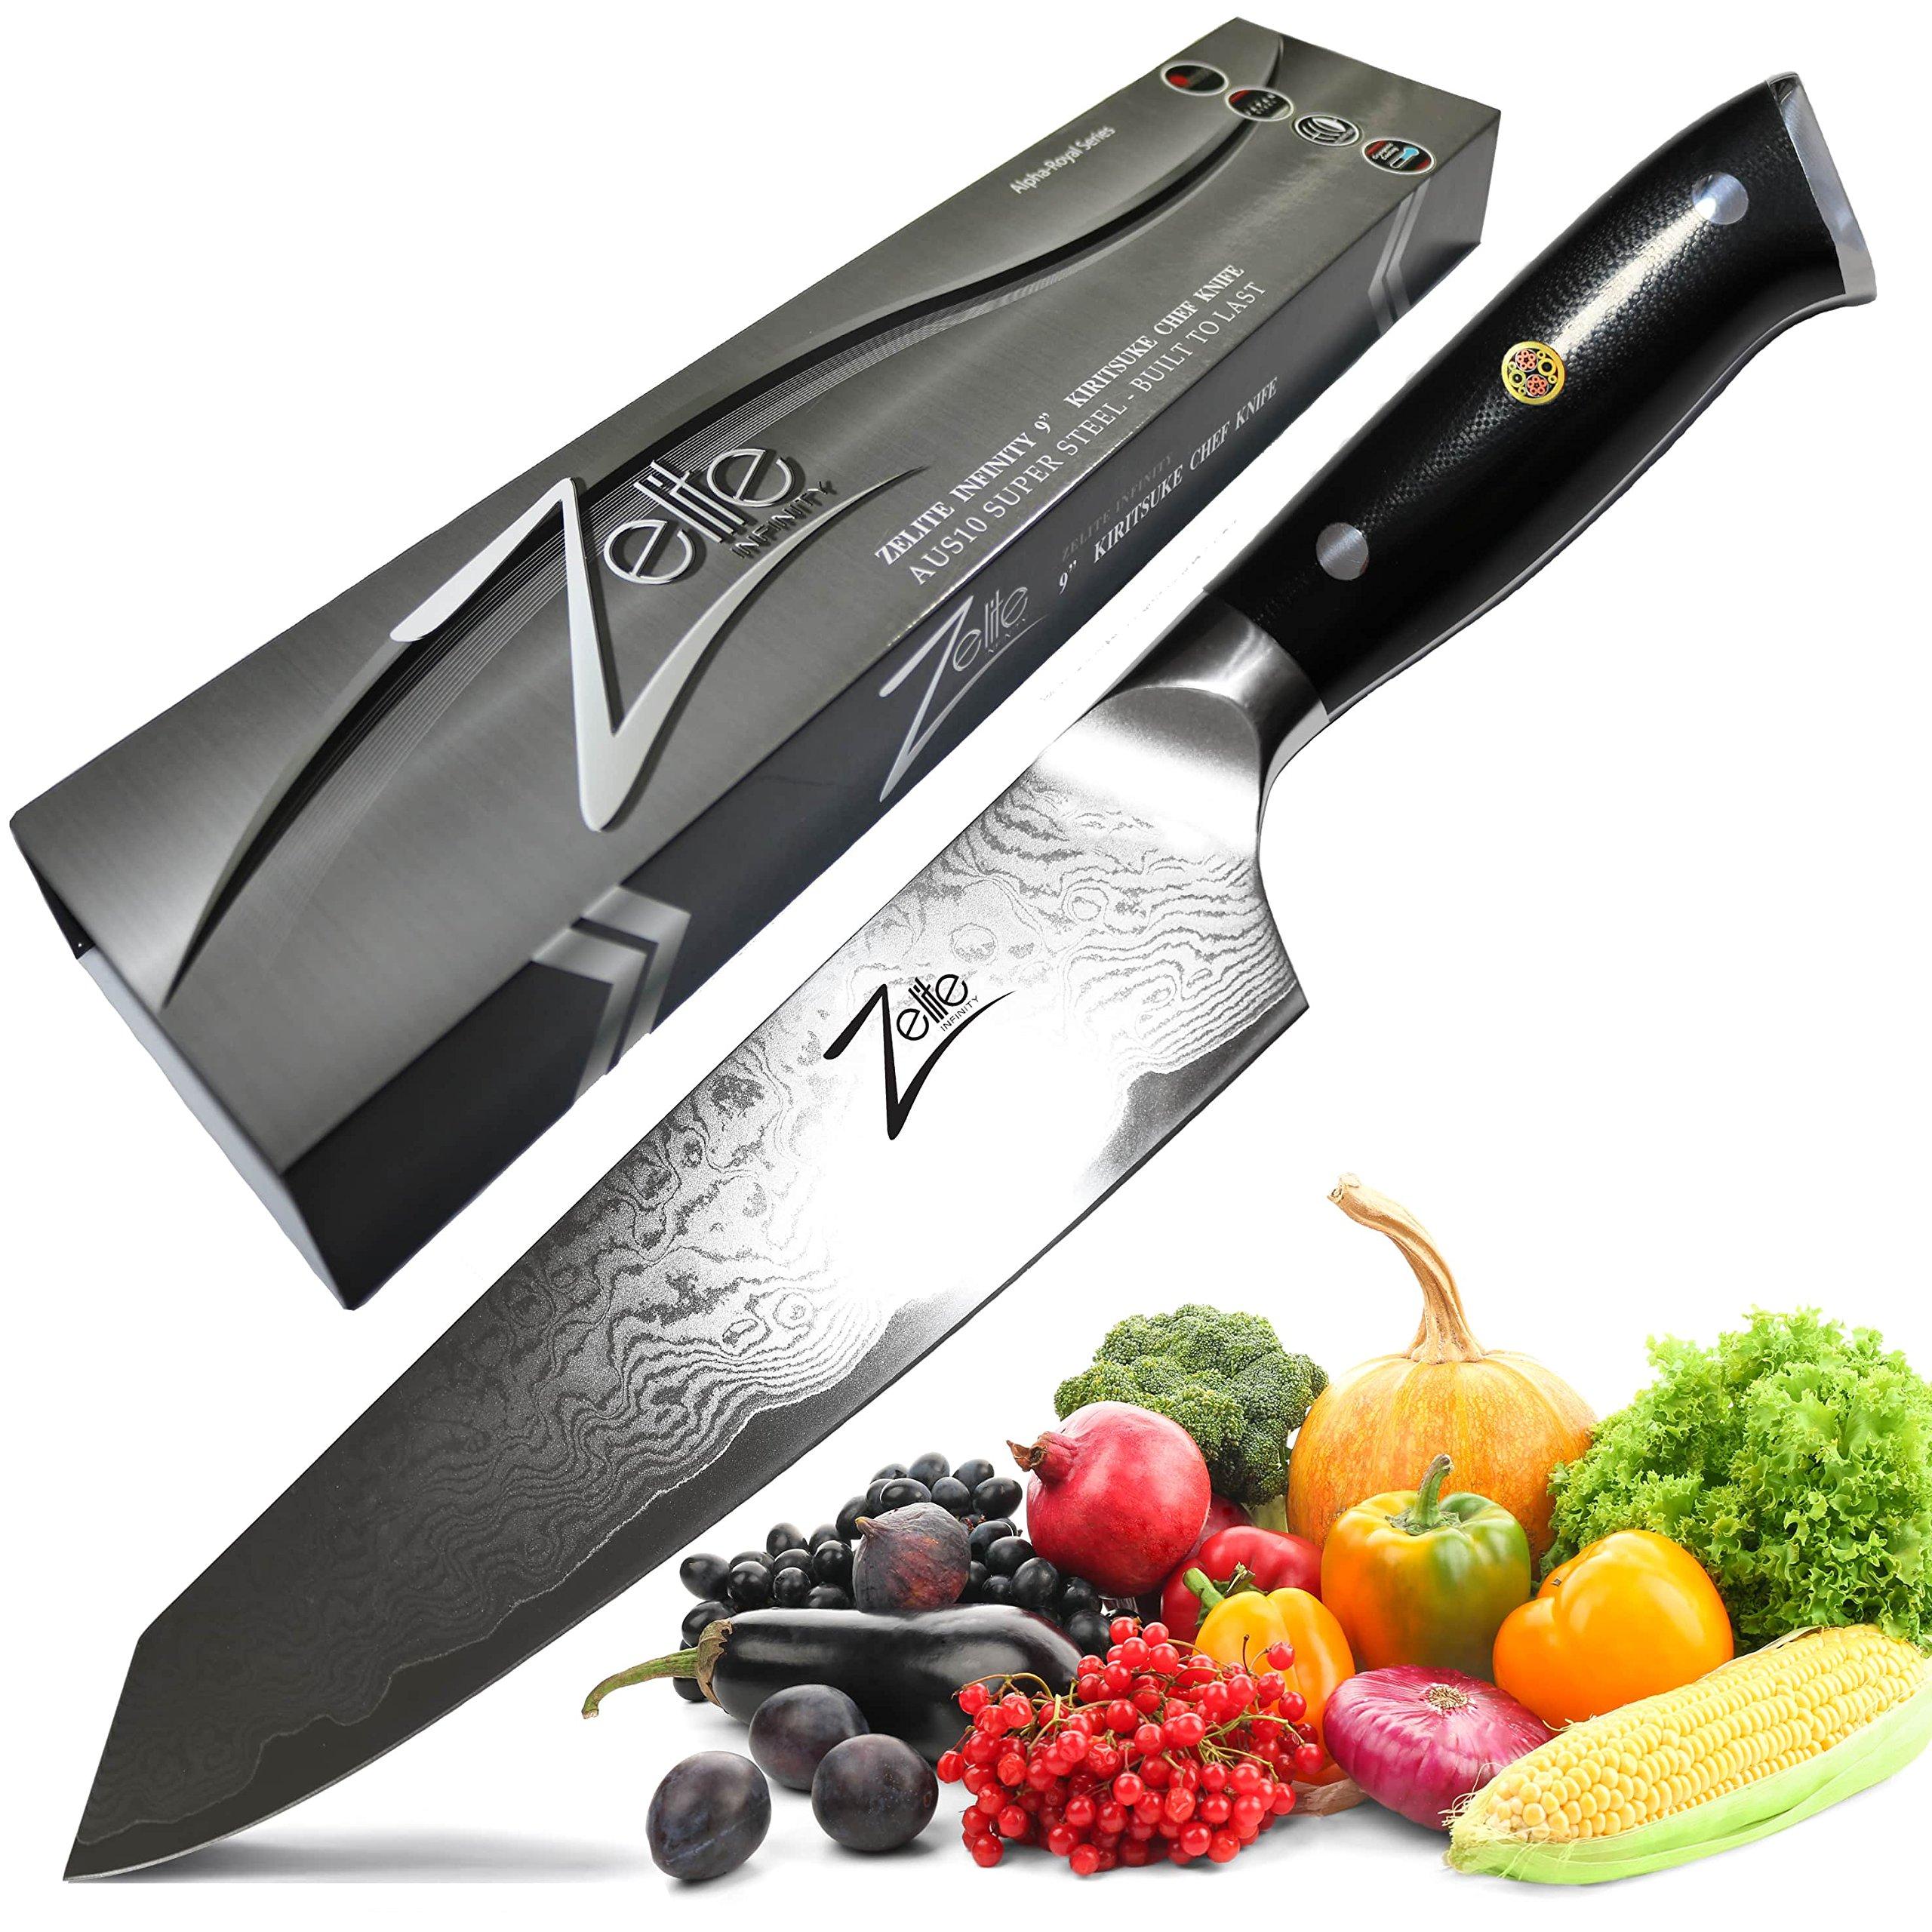 ZELITE INFINITY Kiritsuke Chef Knife 9 inch - Alpha-Royal Series - Best Quality Japanese AUS10 Super Steel 67 Layer Damascus – Surgically Sharp, Superior Performance, Ultra Versatile Chefs Knives